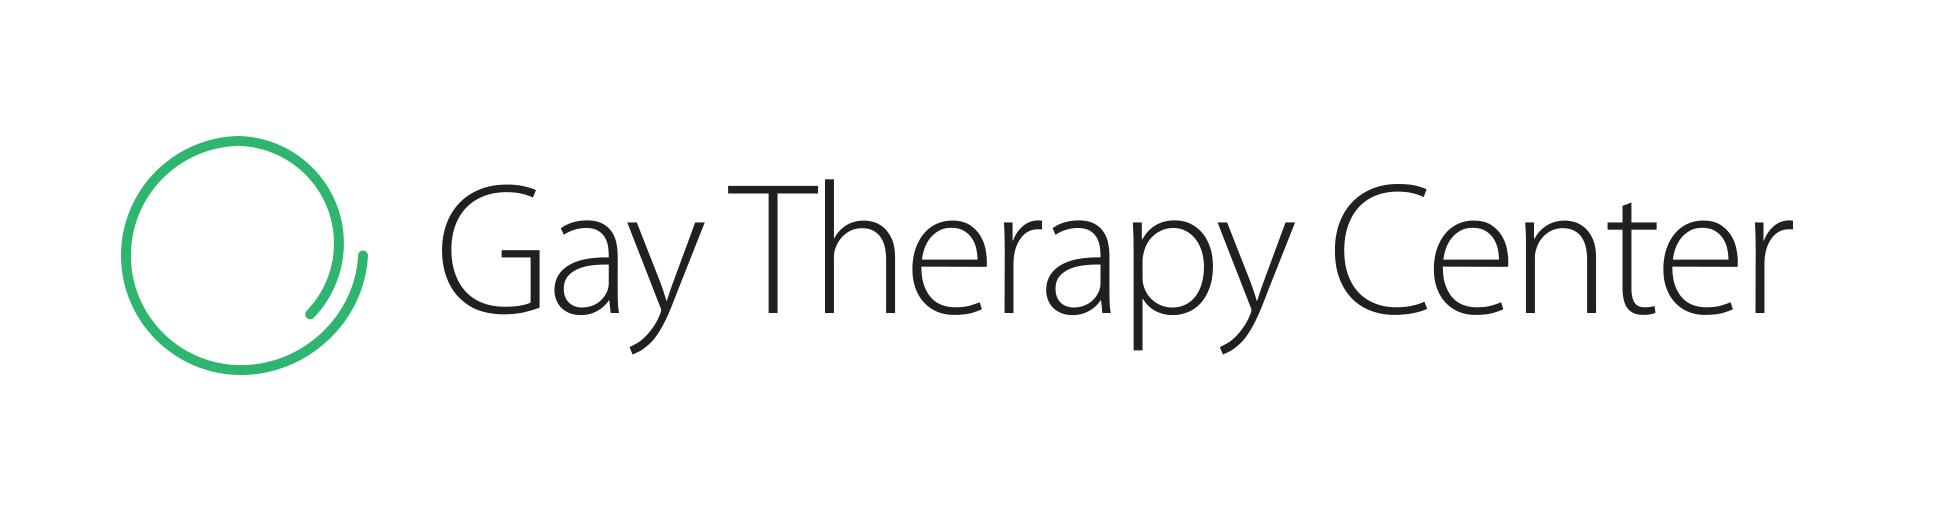 Gay Therapy Center logo